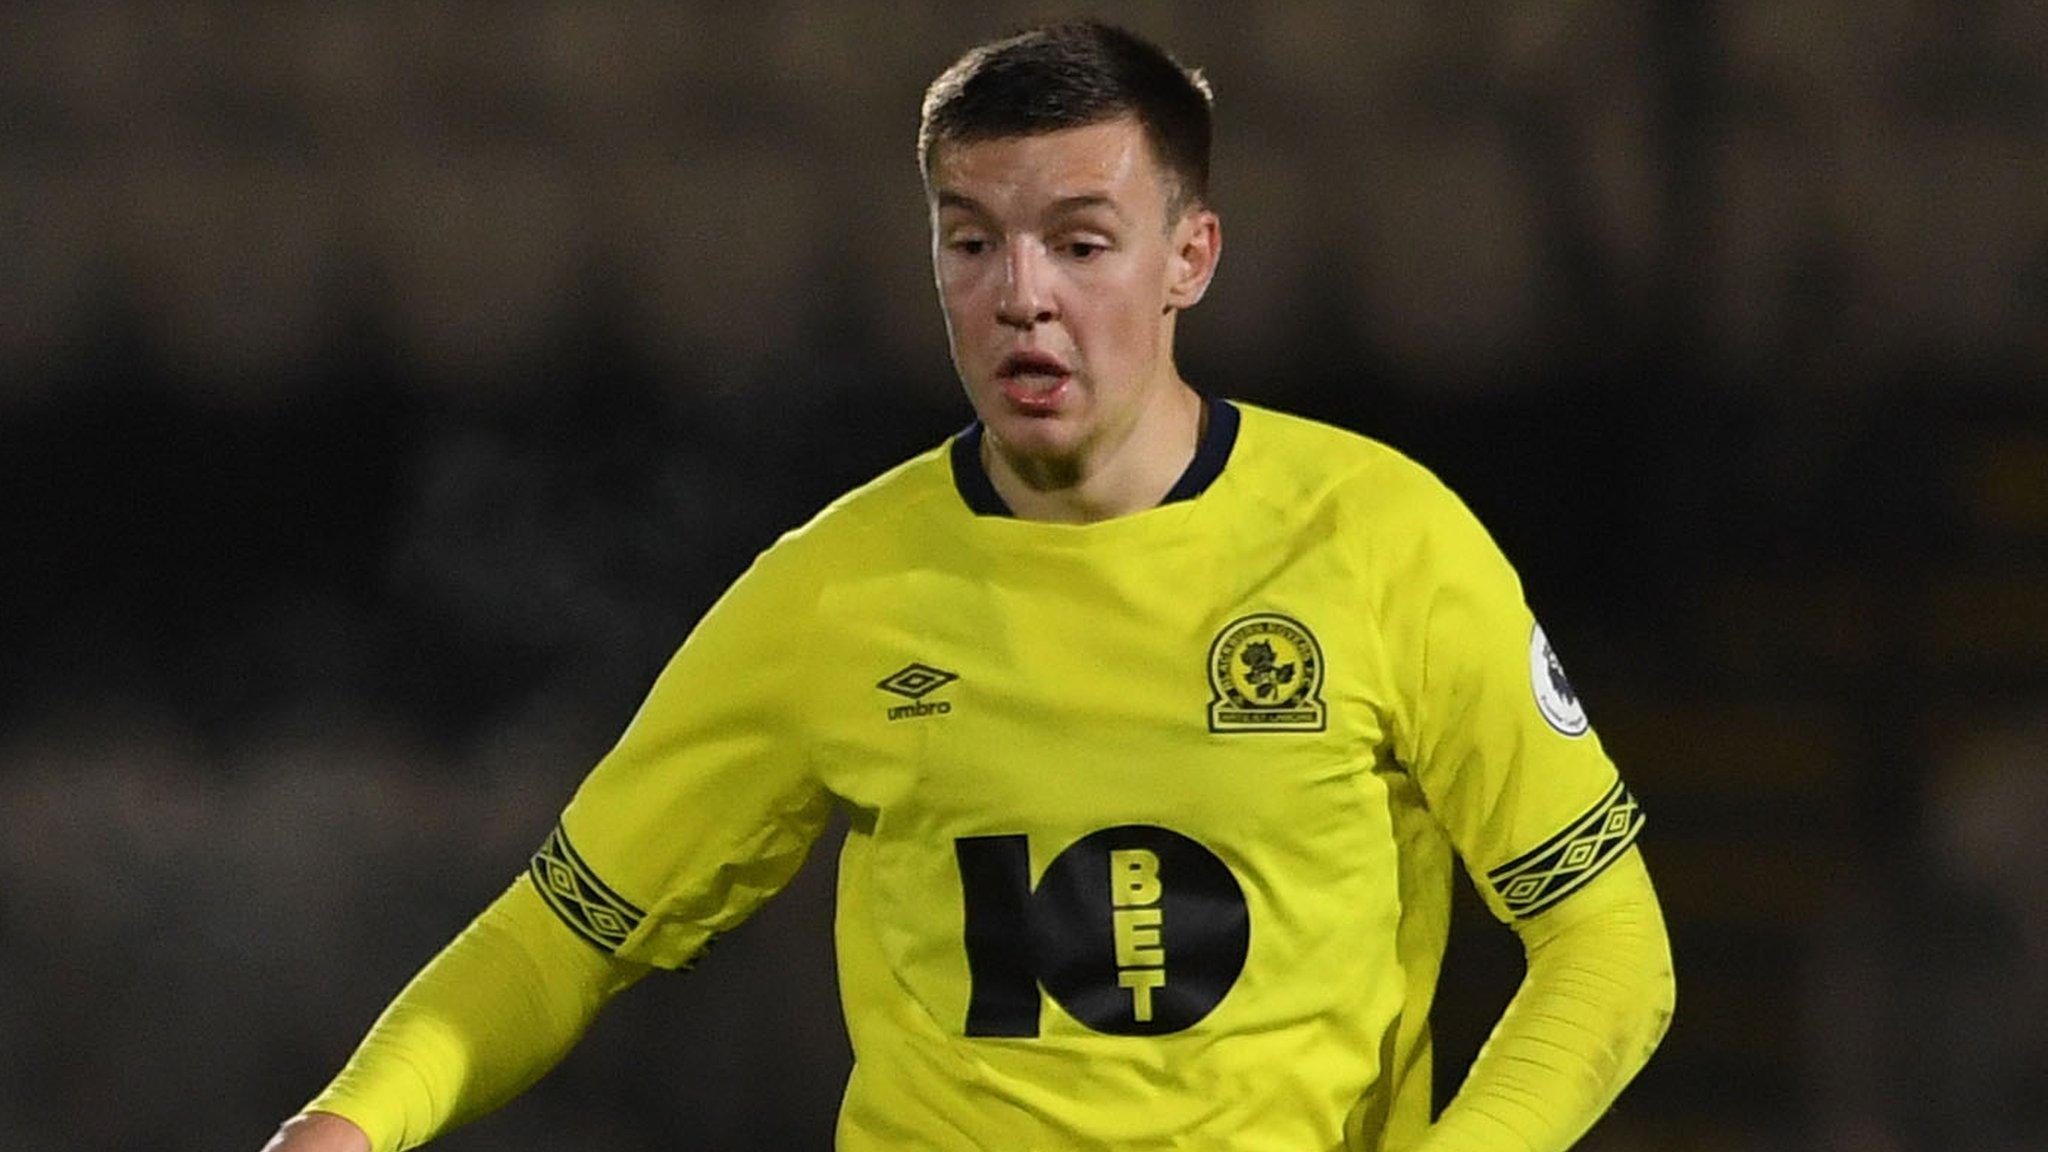 St Mirren: Blackburn Rovers' Brad Lyons reunited with Oran Kearney after loan